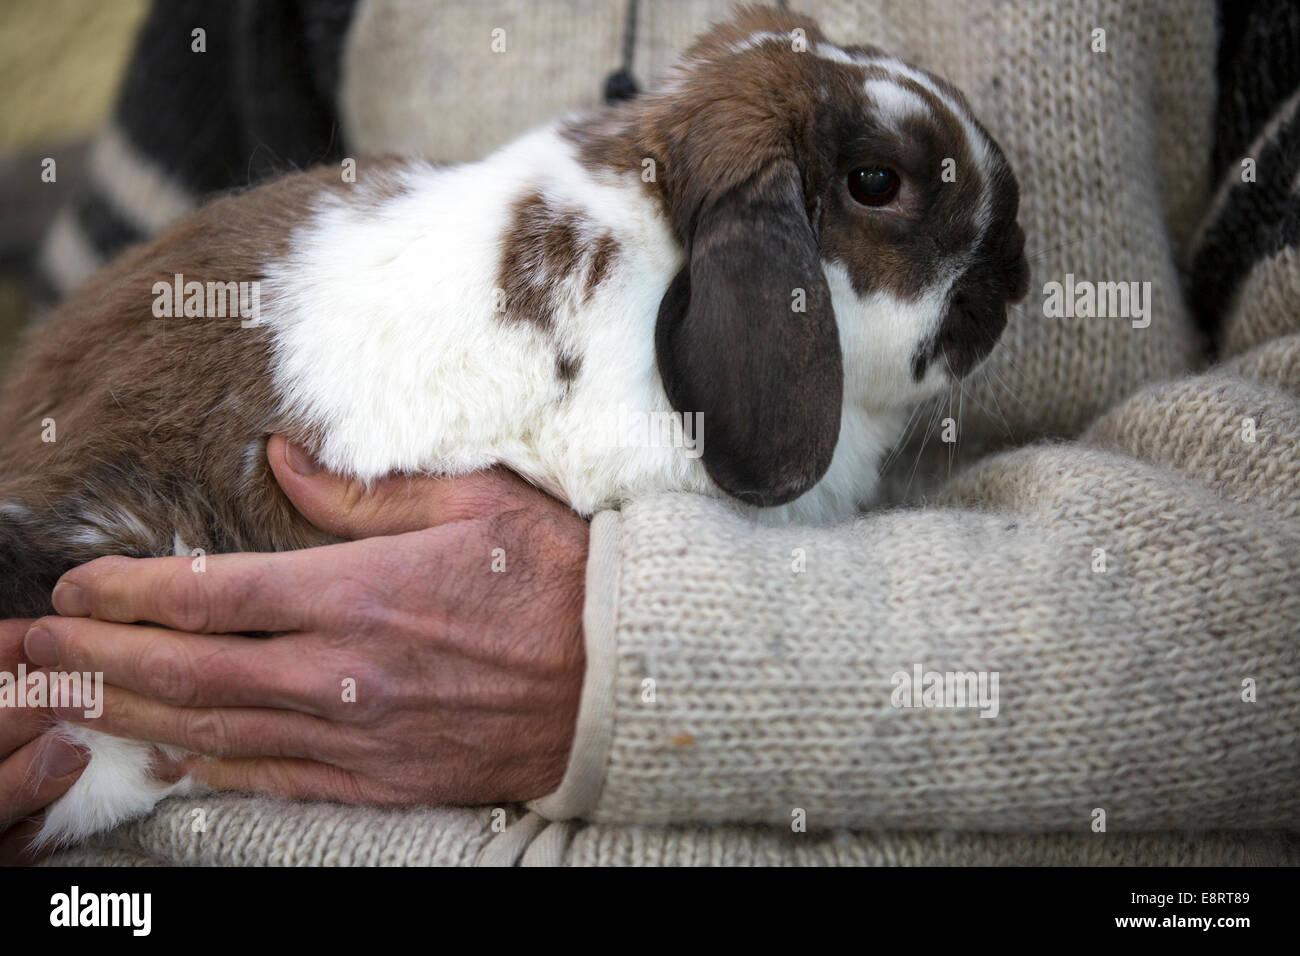 Man cuddling pet Holland Lop rabbit. - Stock Image